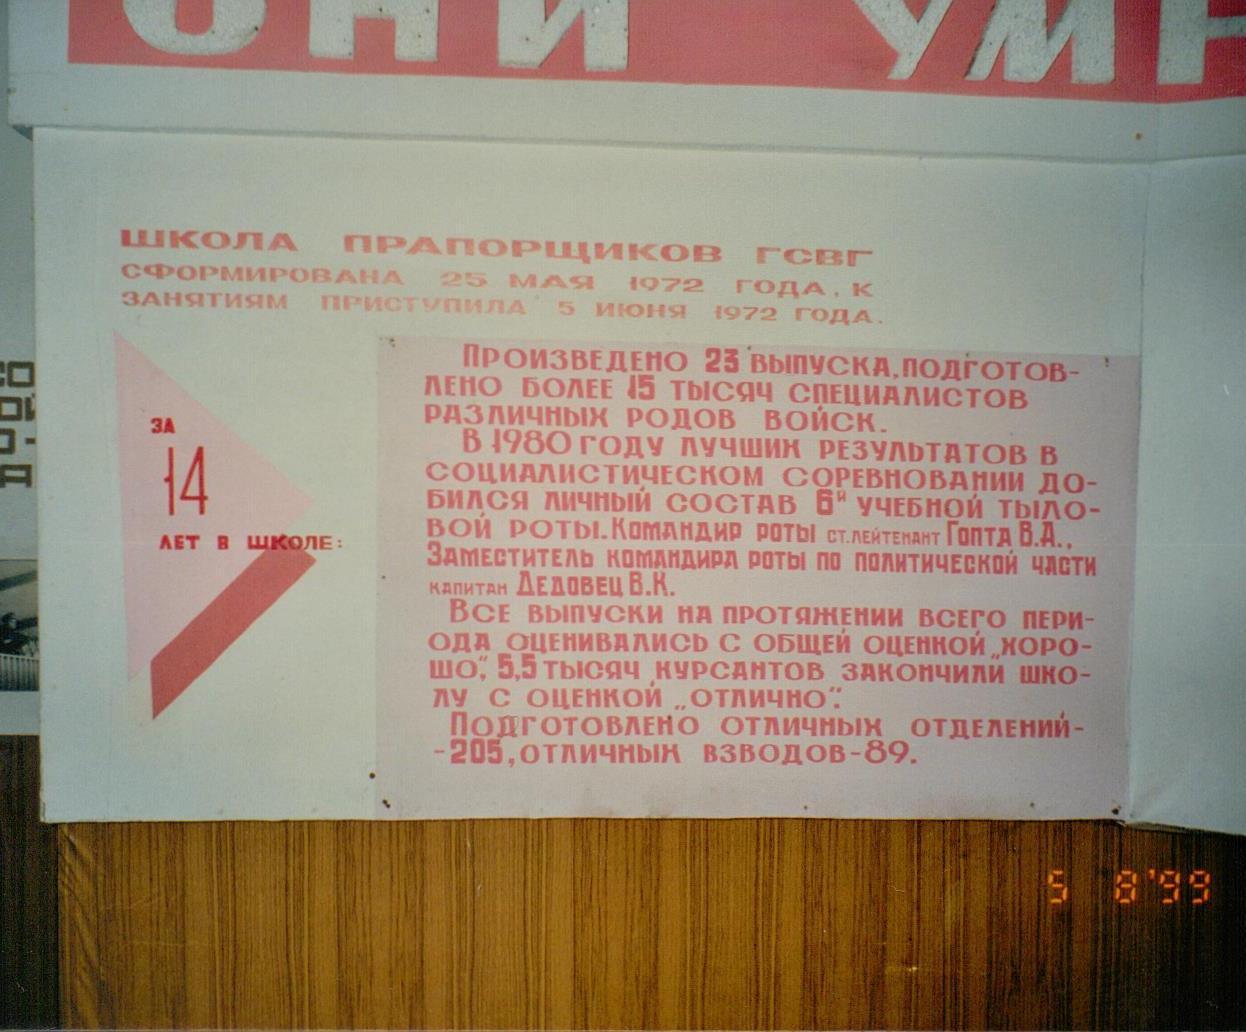 http://s3.uploads.ru/zJ4Fh.jpg